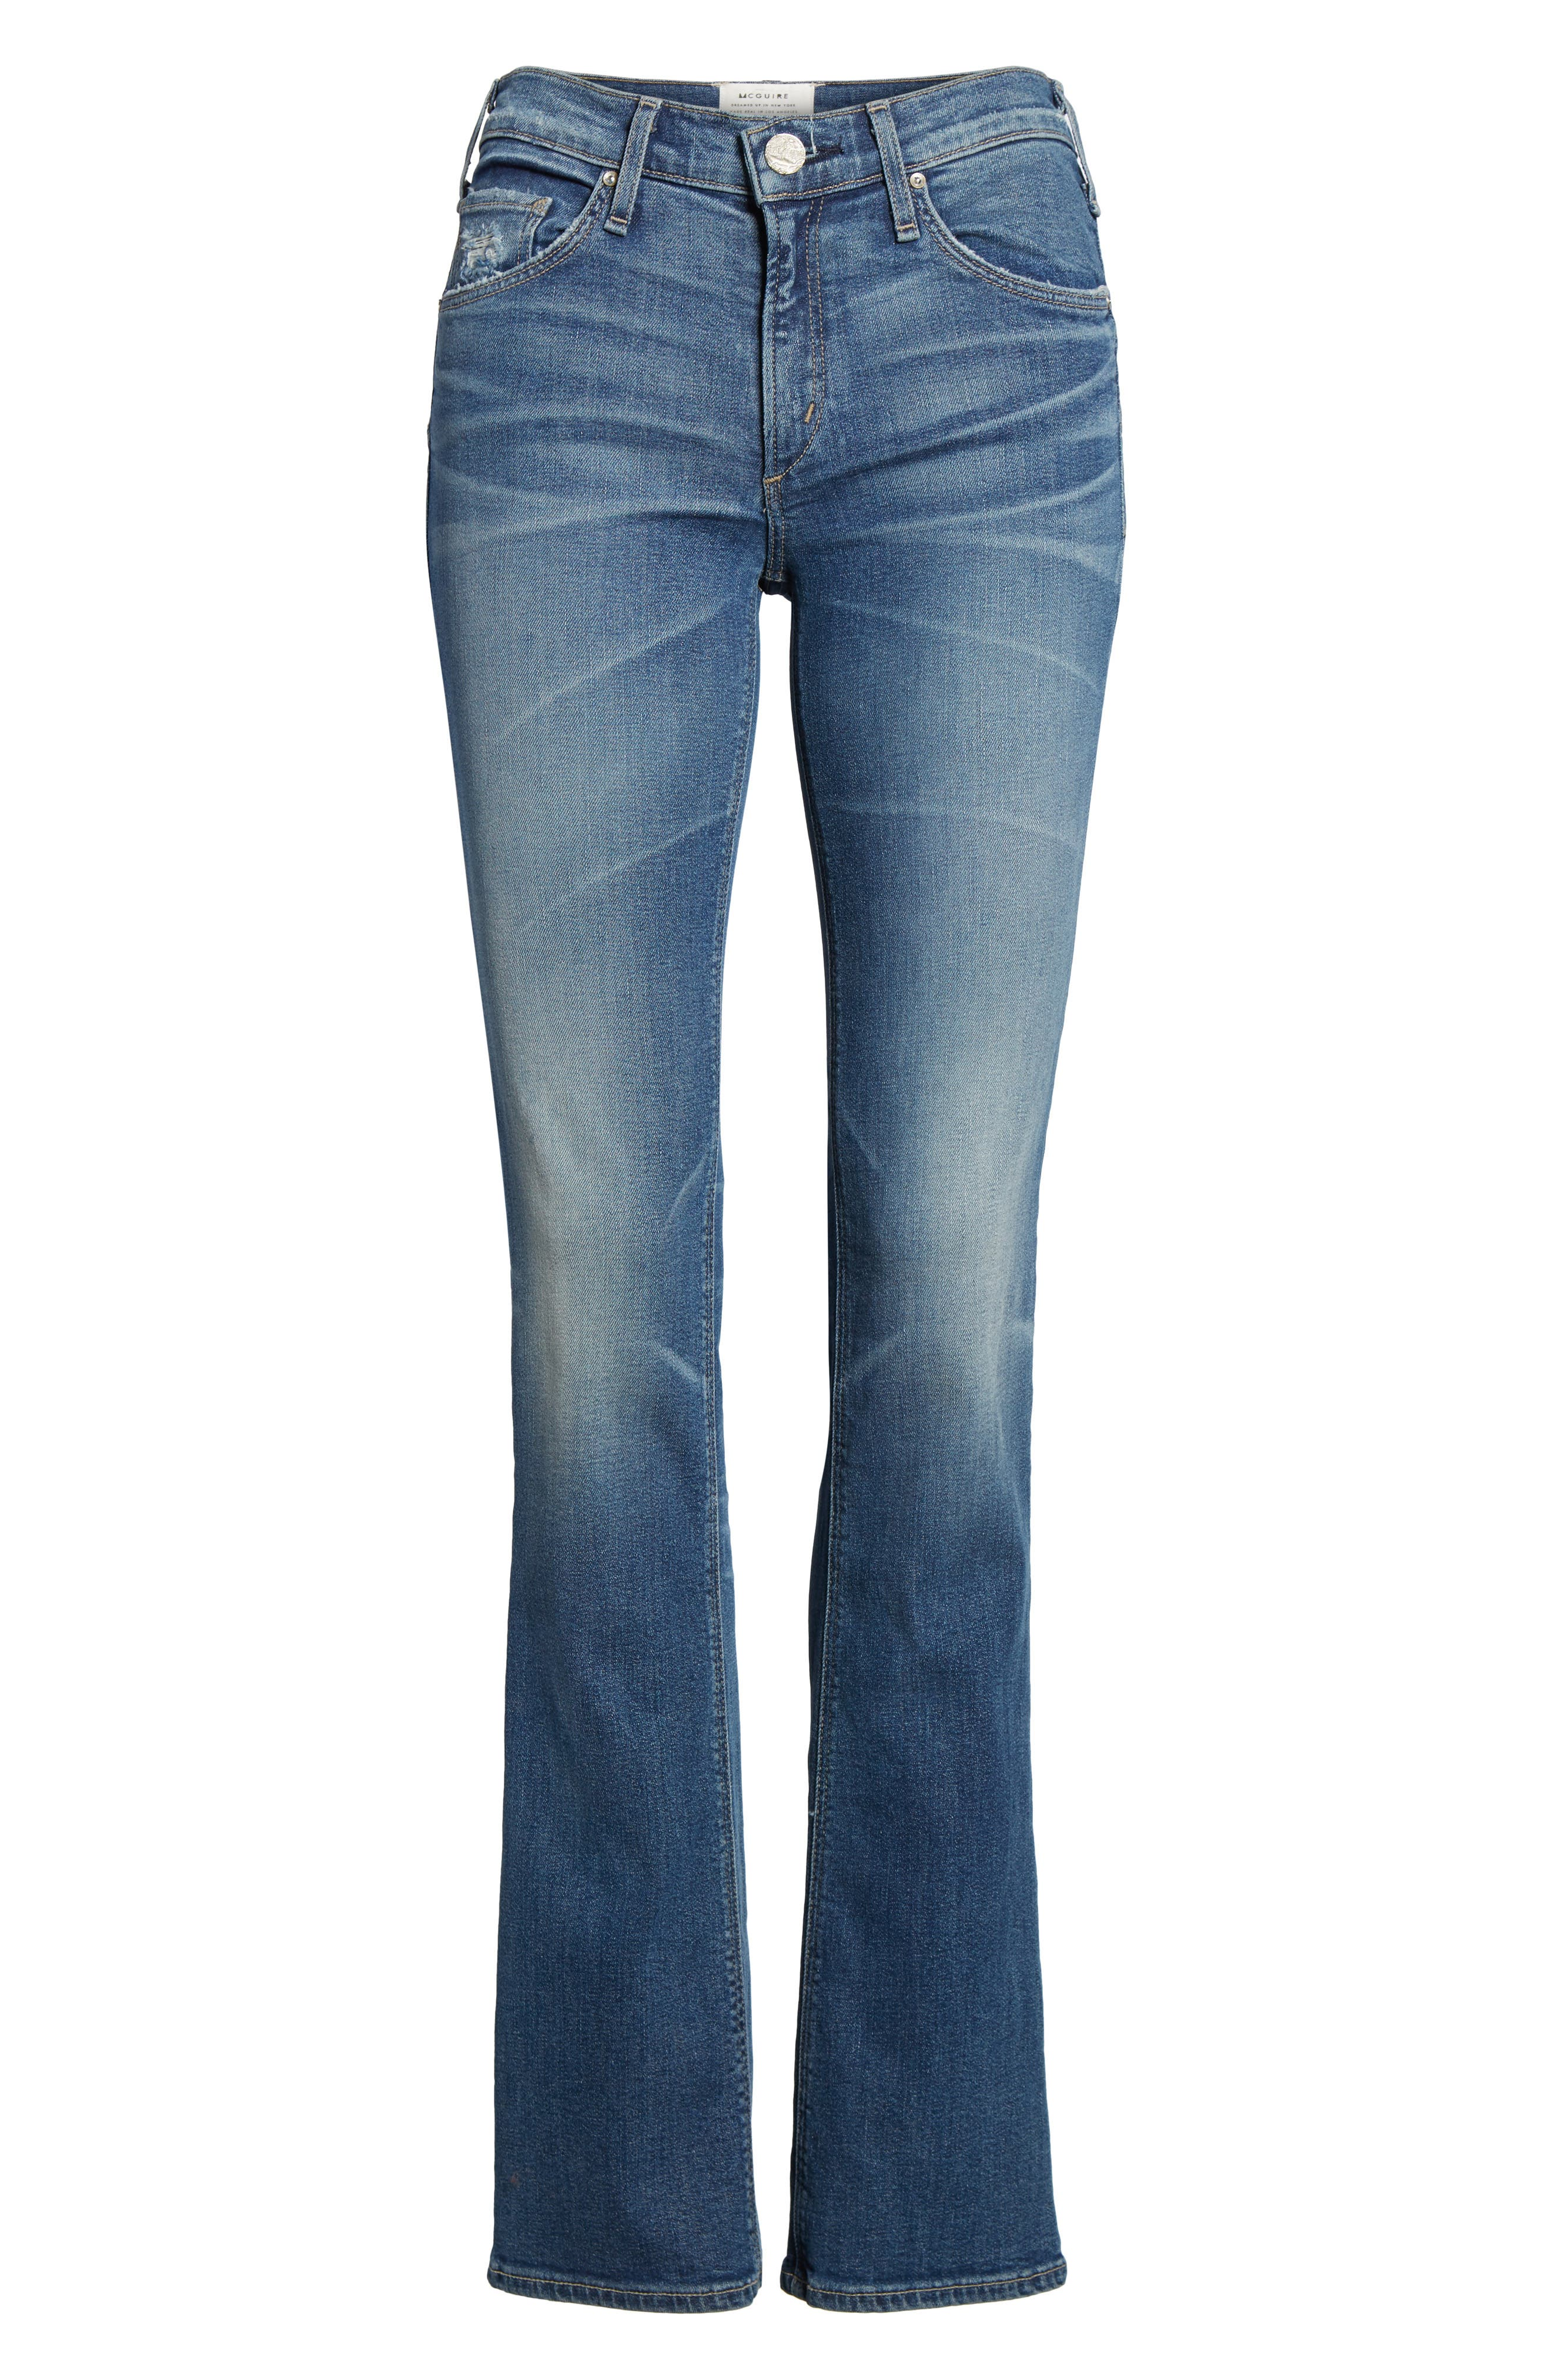 Gainsbourg High Waist Bootcut Jeans,                             Alternate thumbnail 7, color,